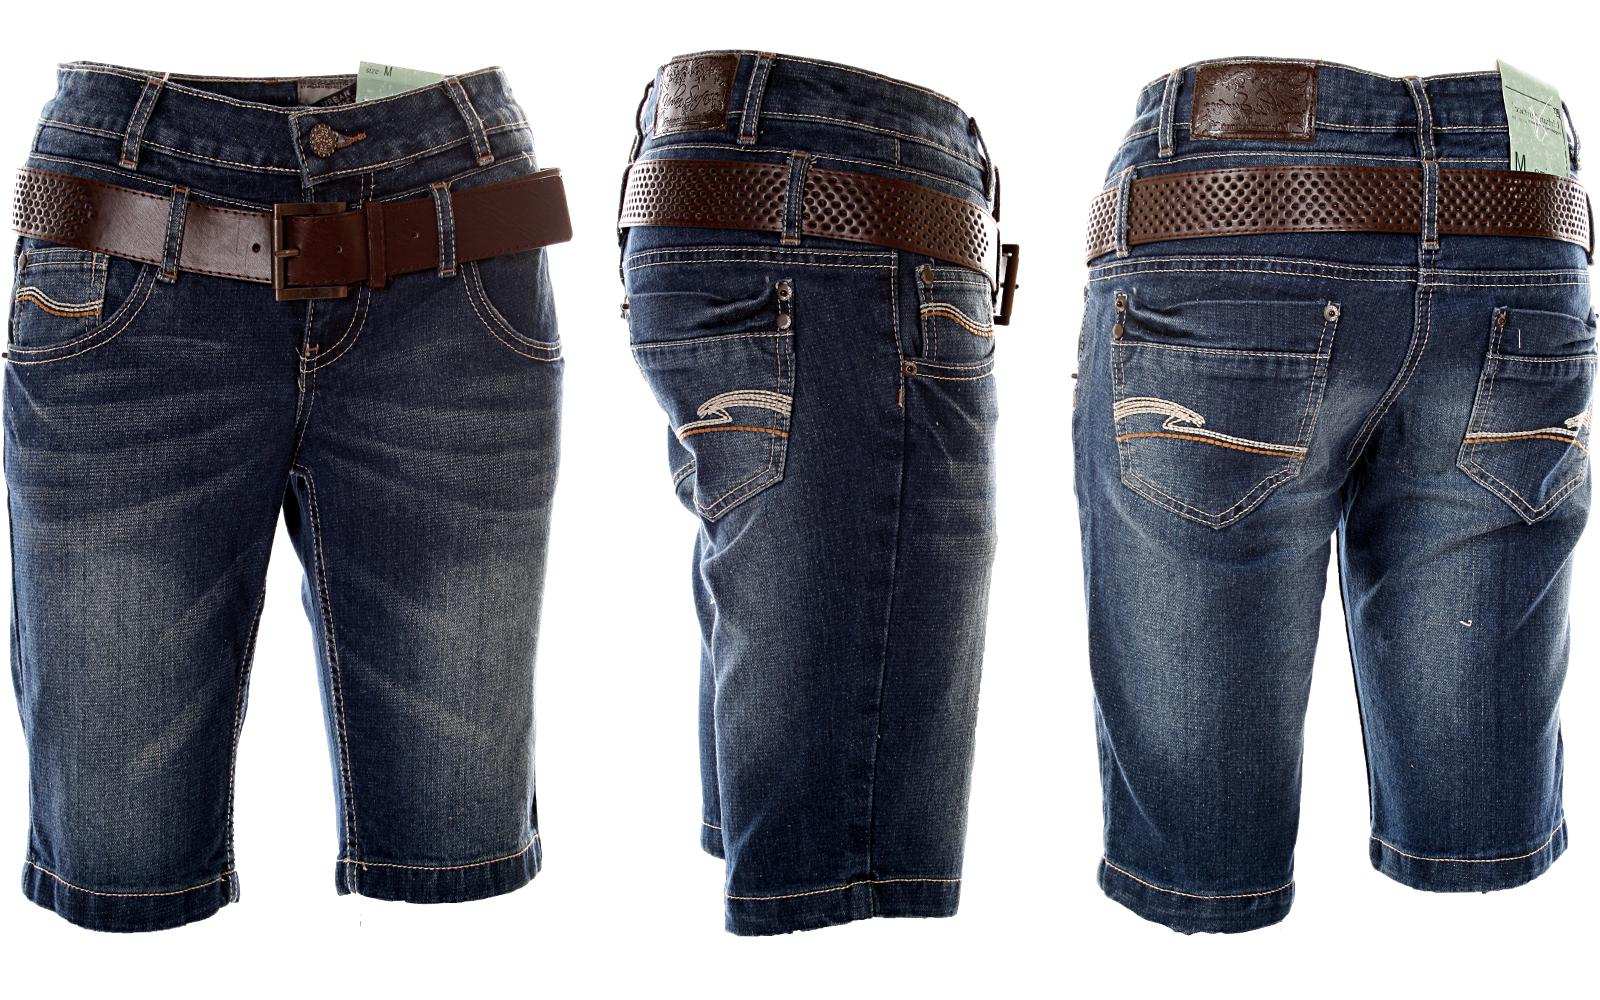 neu sexy damen bermuda g rtel shorts jeans short dark blue denim xs s m l xl ebay. Black Bedroom Furniture Sets. Home Design Ideas